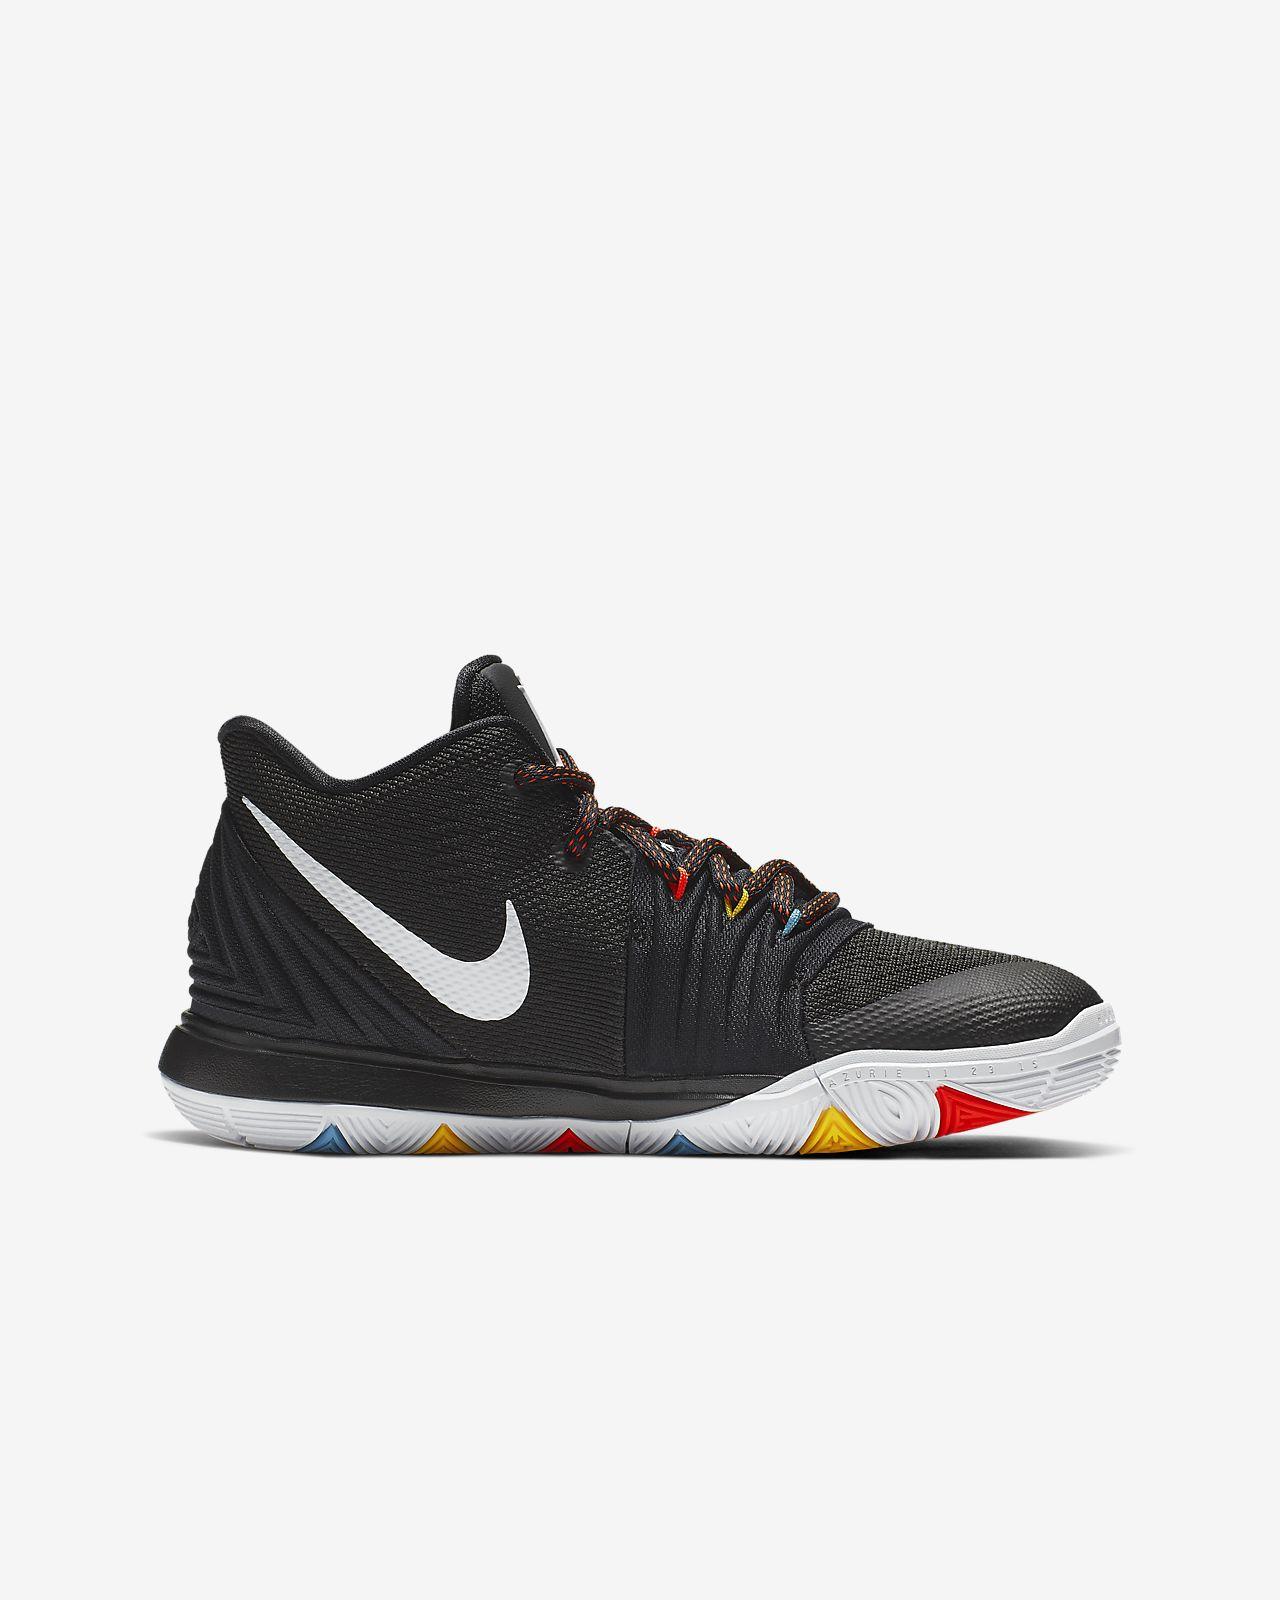 best service 5671a 18df4 Kyrie 5 Big Kids  Shoe. Nike.com